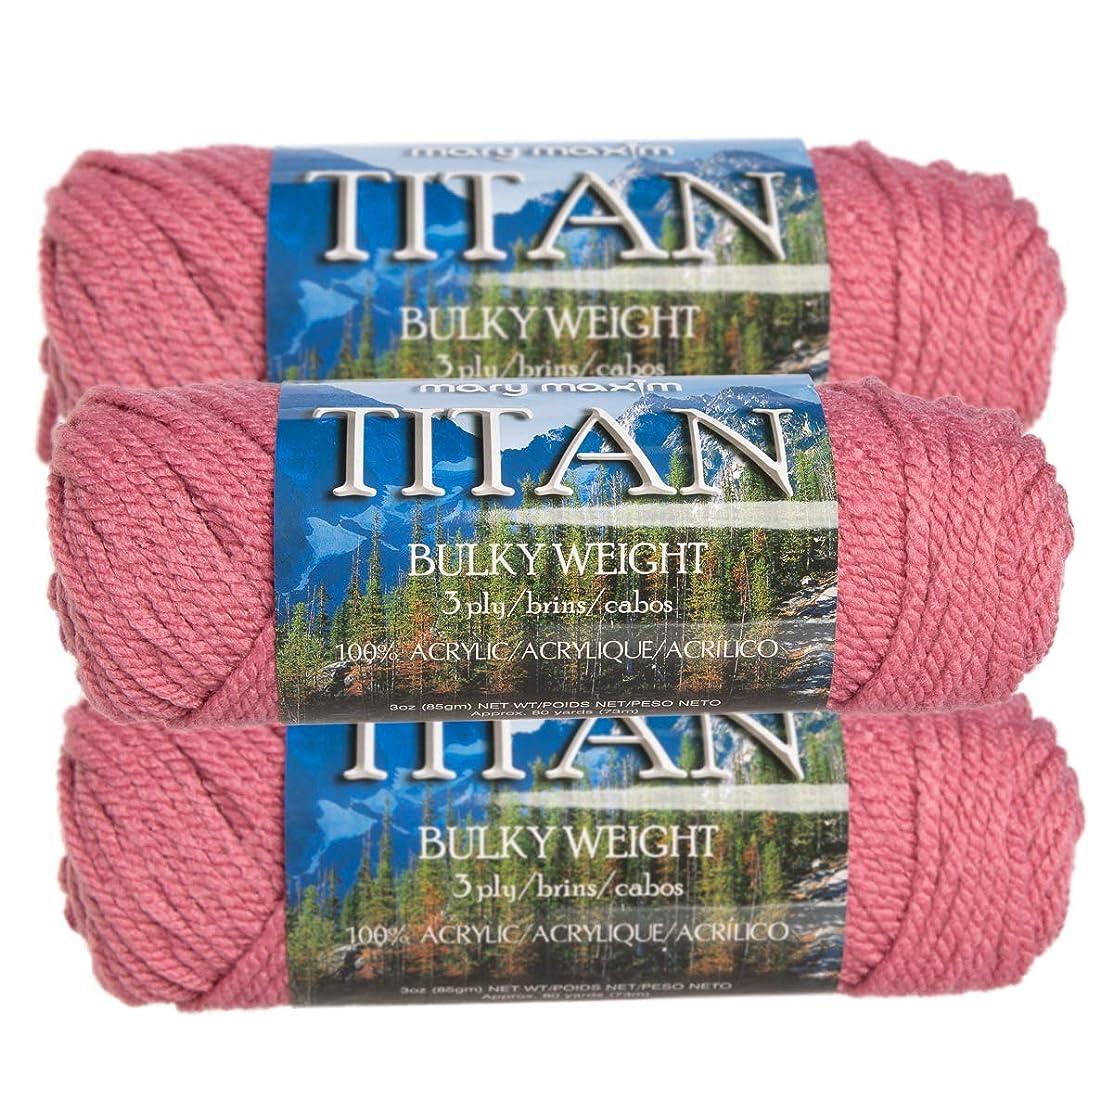 Mary Maxim (3 Pack Titan 100% Acrylic Soft Rose Pink Yarn for Knitting Crocheting #5 Bulky